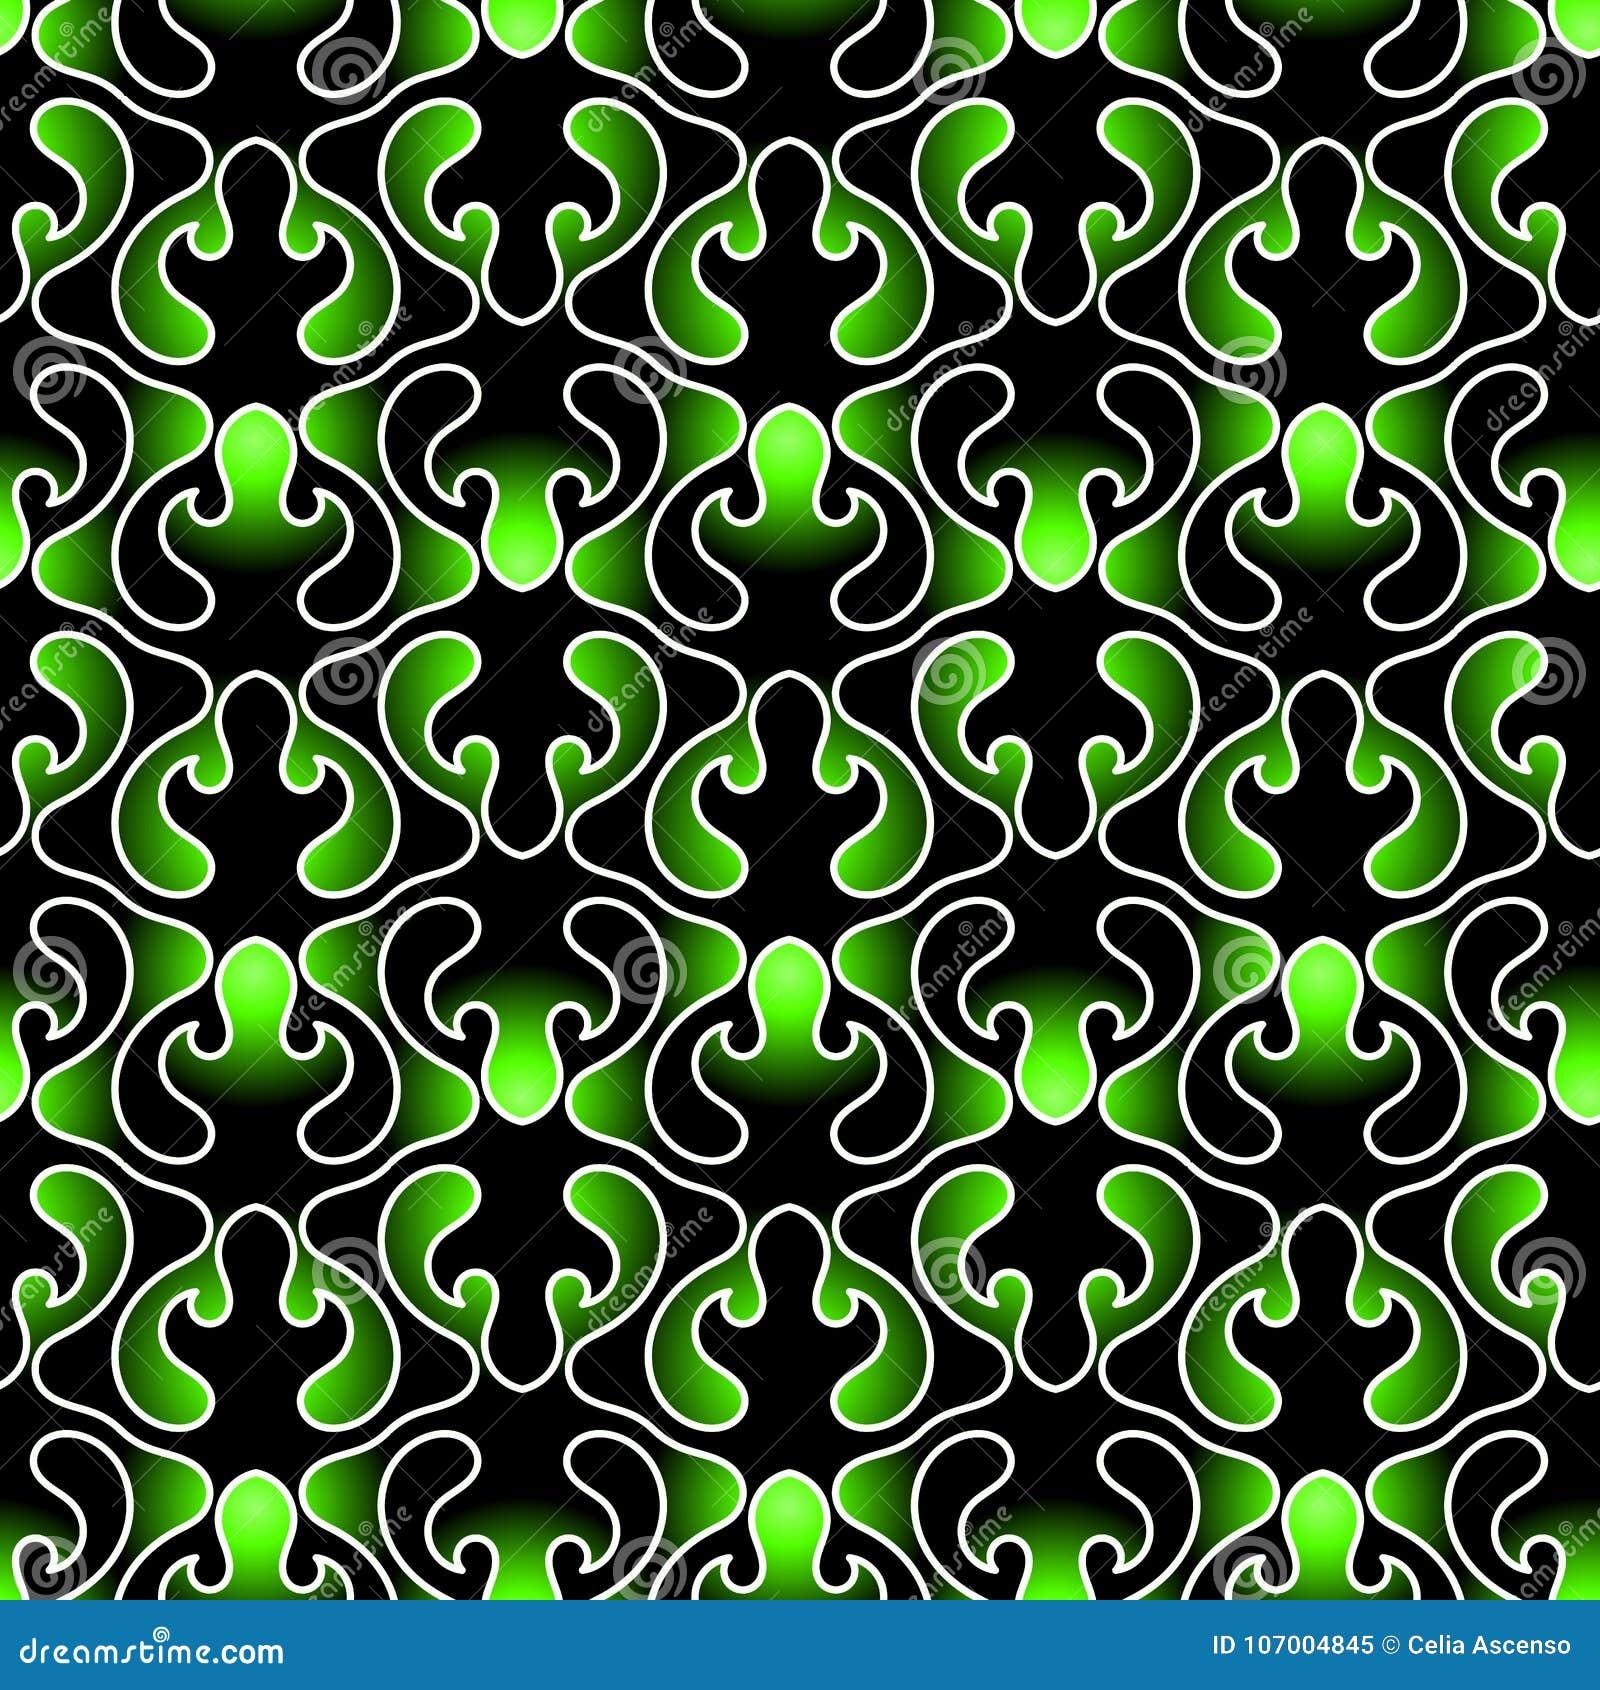 Download Dark Leafs Seamless Texture Wallpaper Stock Illustration    Illustration Of Emerald, Grass: 107004845